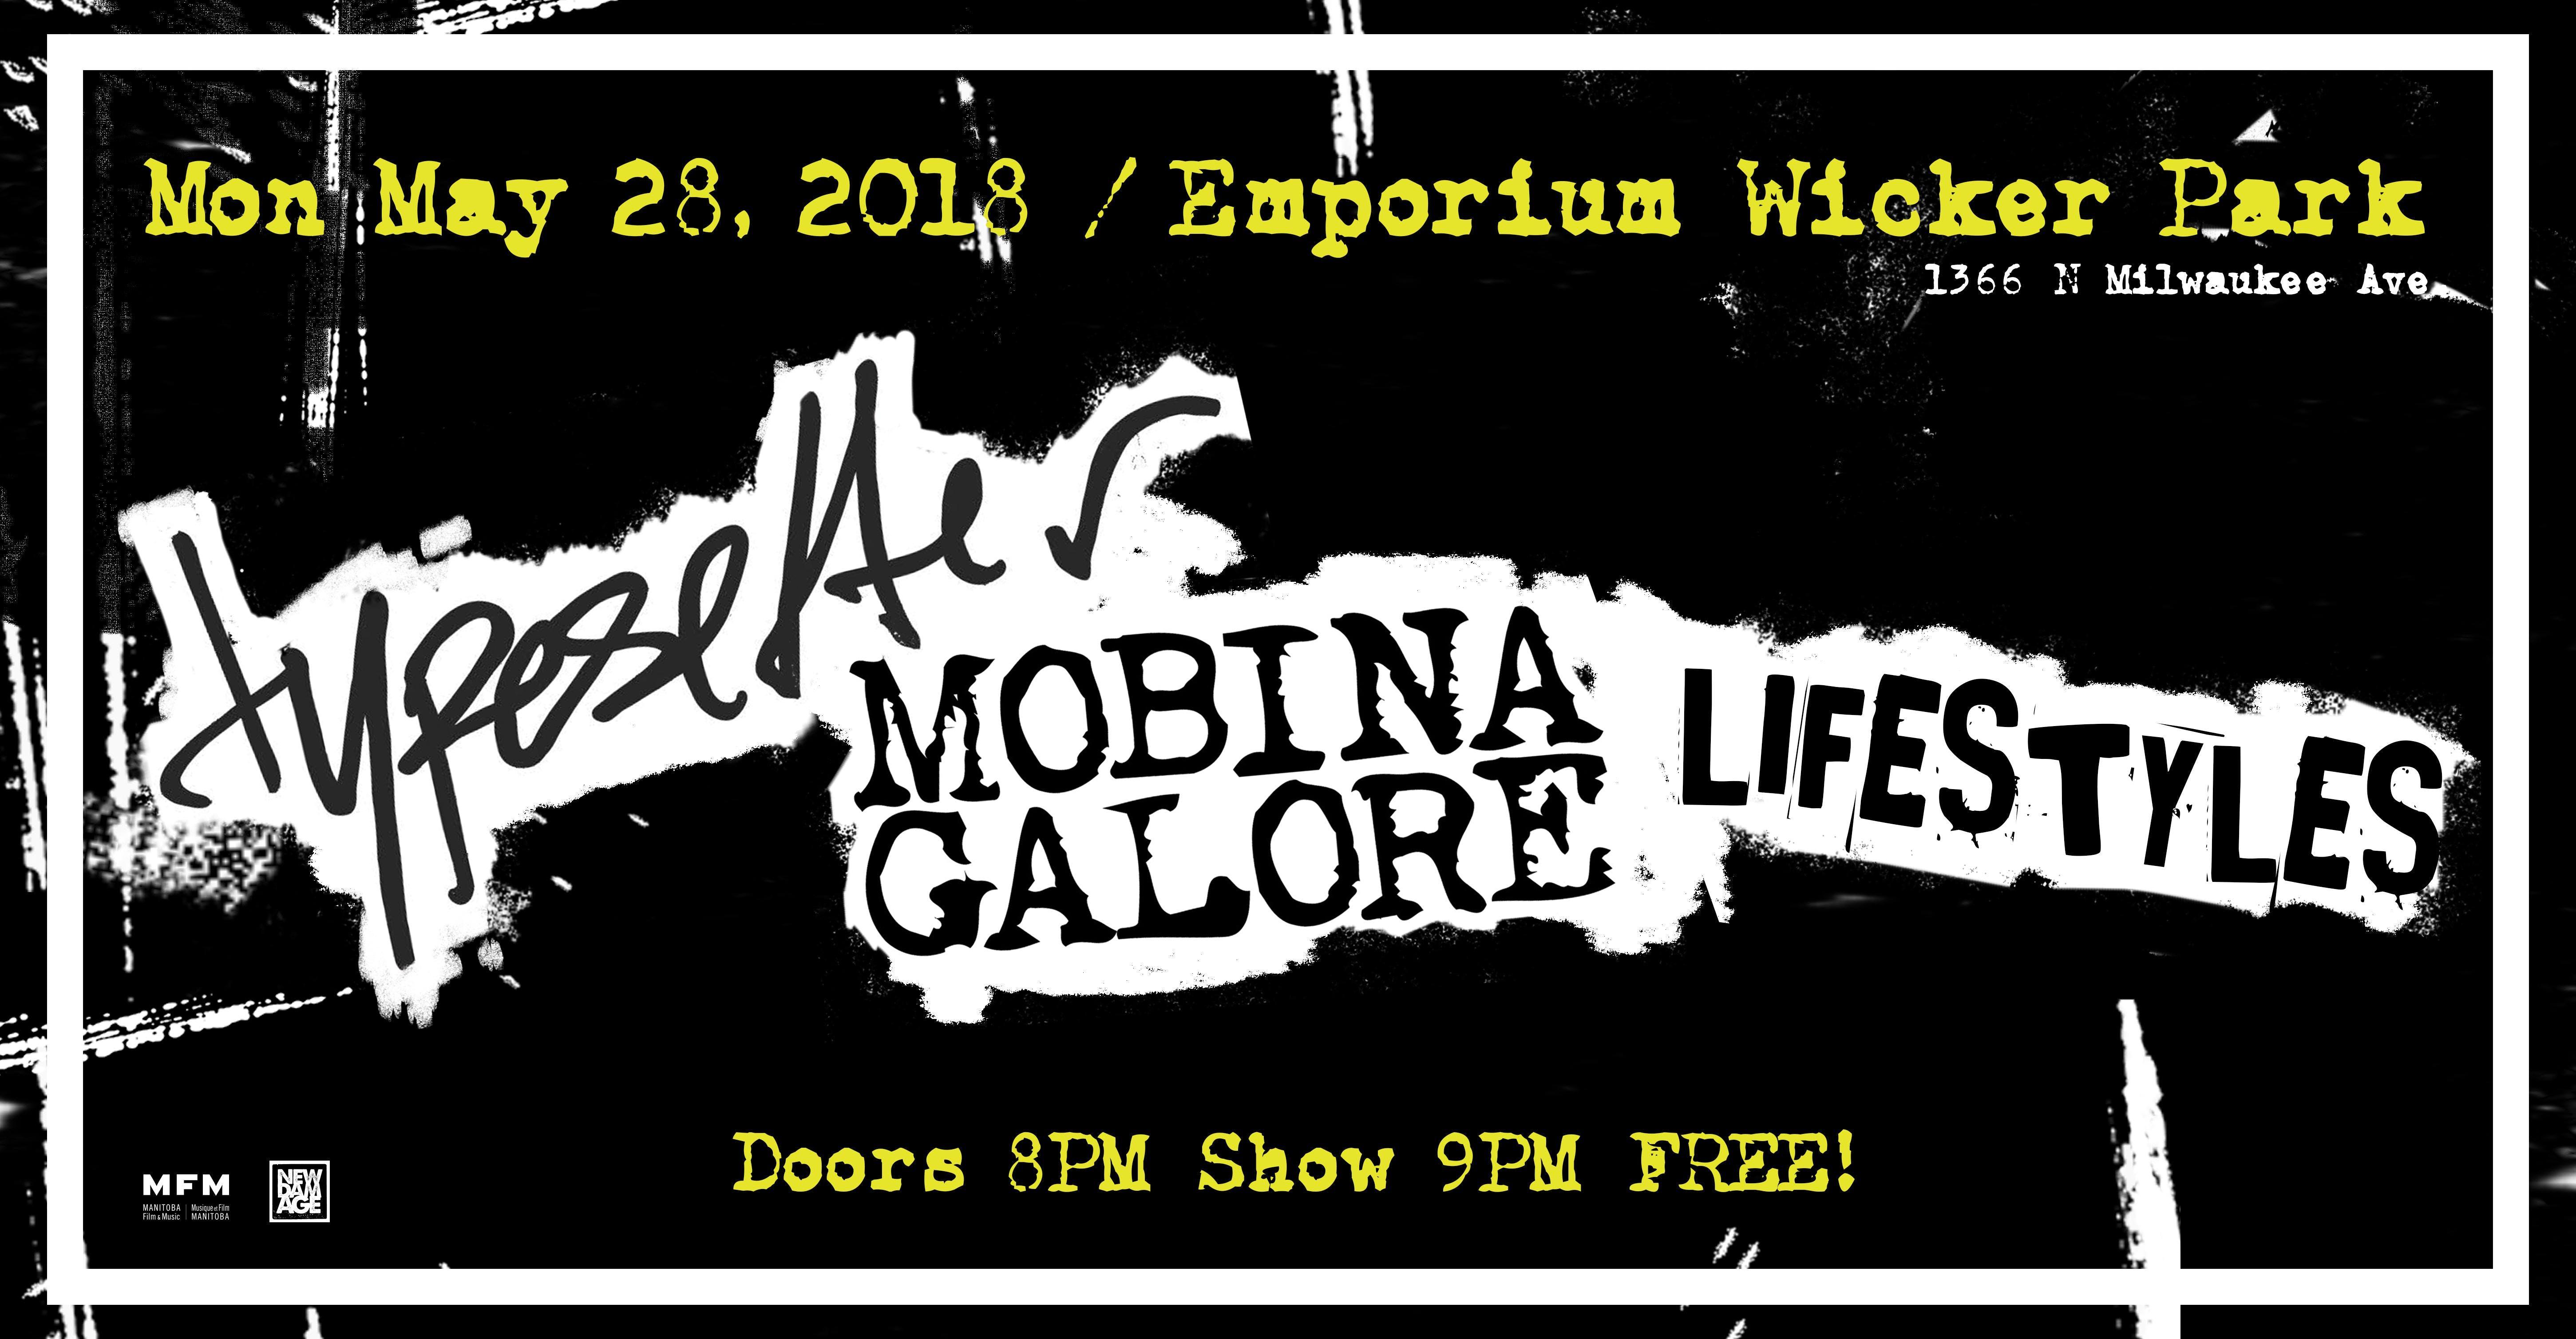 Typesetter / Mobina Galore / Lifestyles